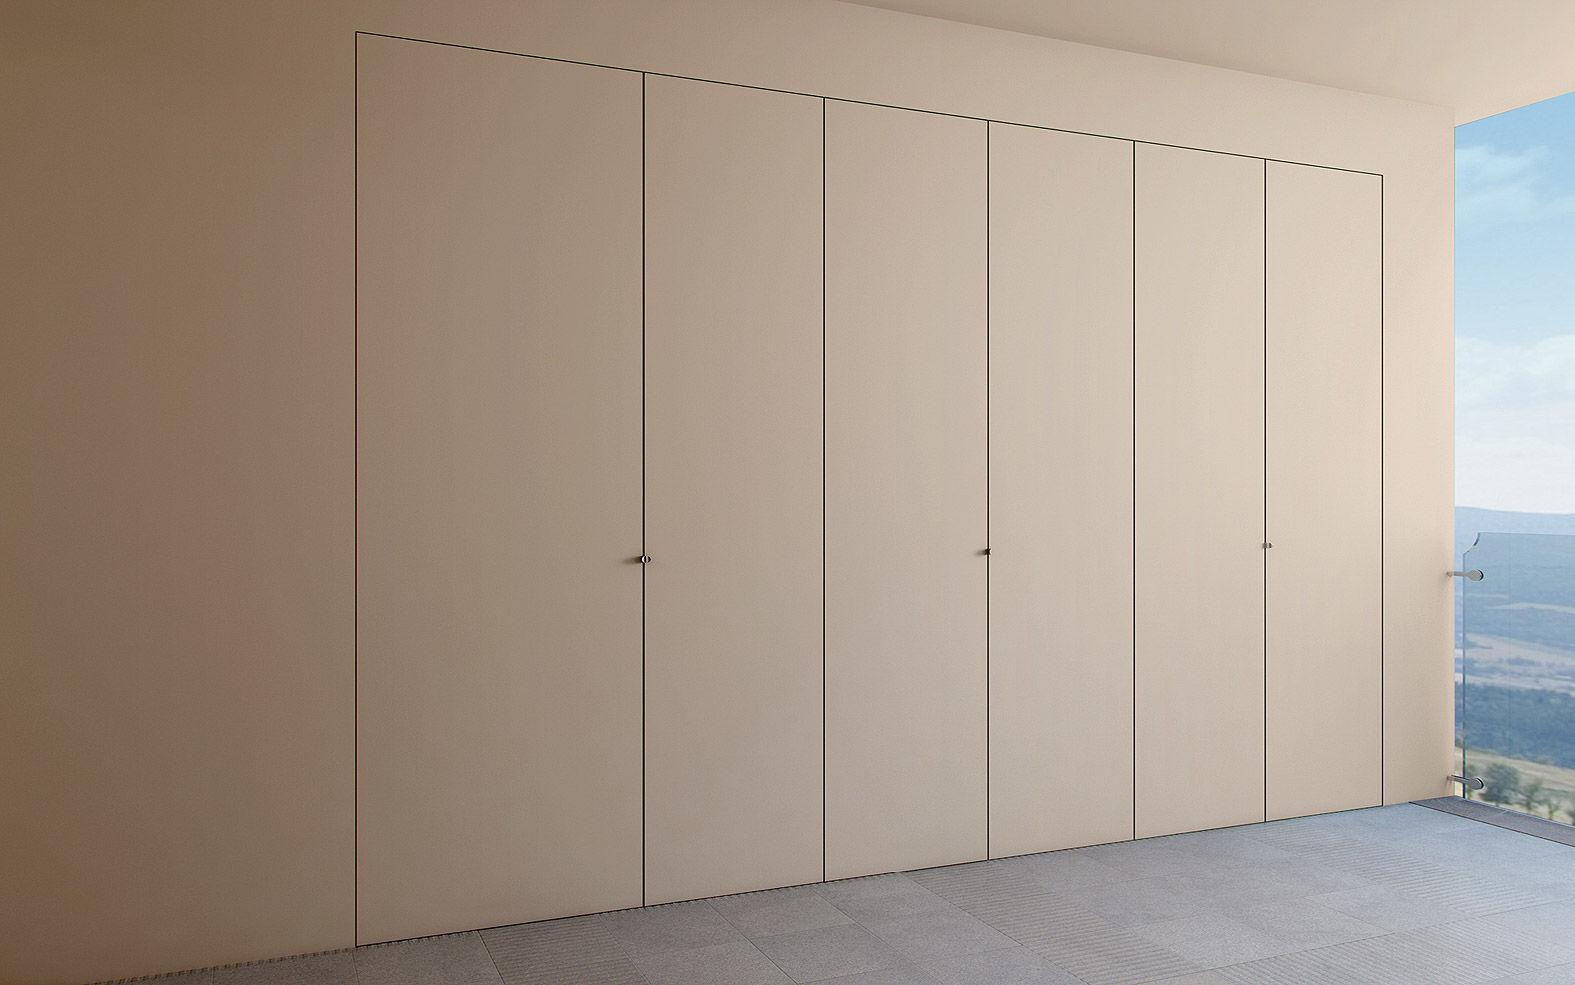 Closet Door Swing Solid Wood Aluminum Filoparete